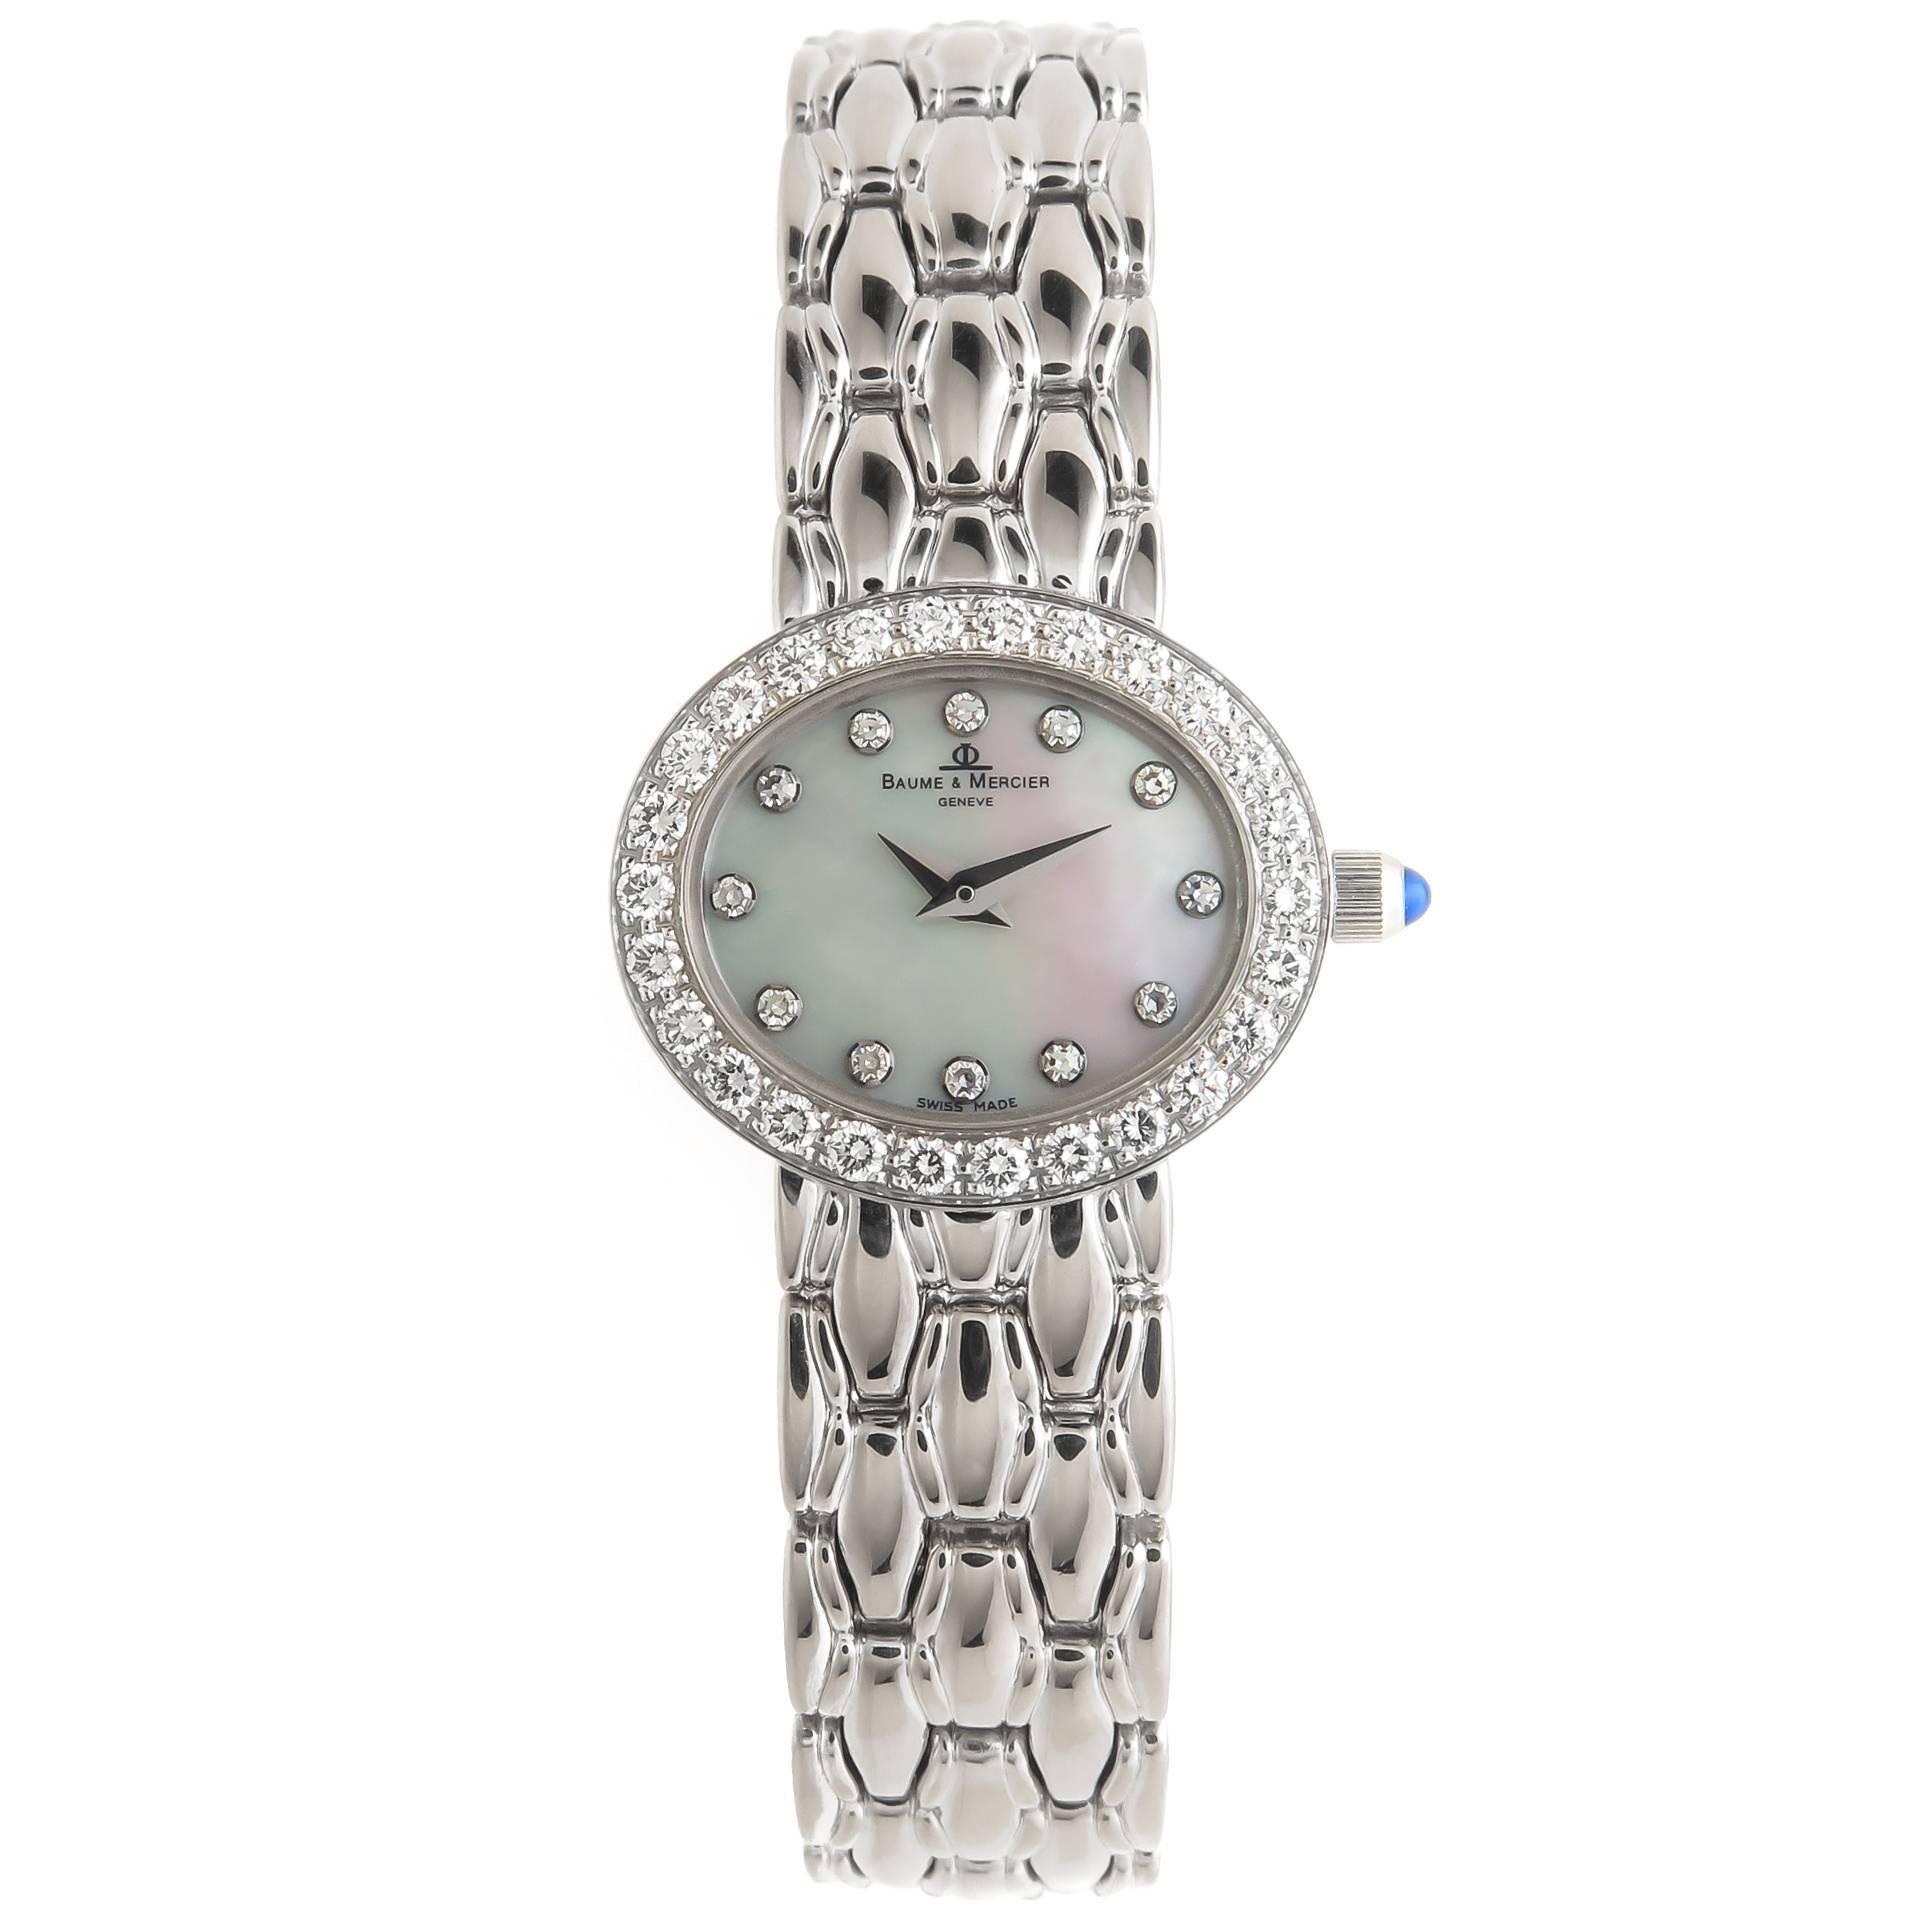 756e2b7d982 Baume and Mercier Ladies White Gold Diamond Quartz Wristwatch at 1stdibs